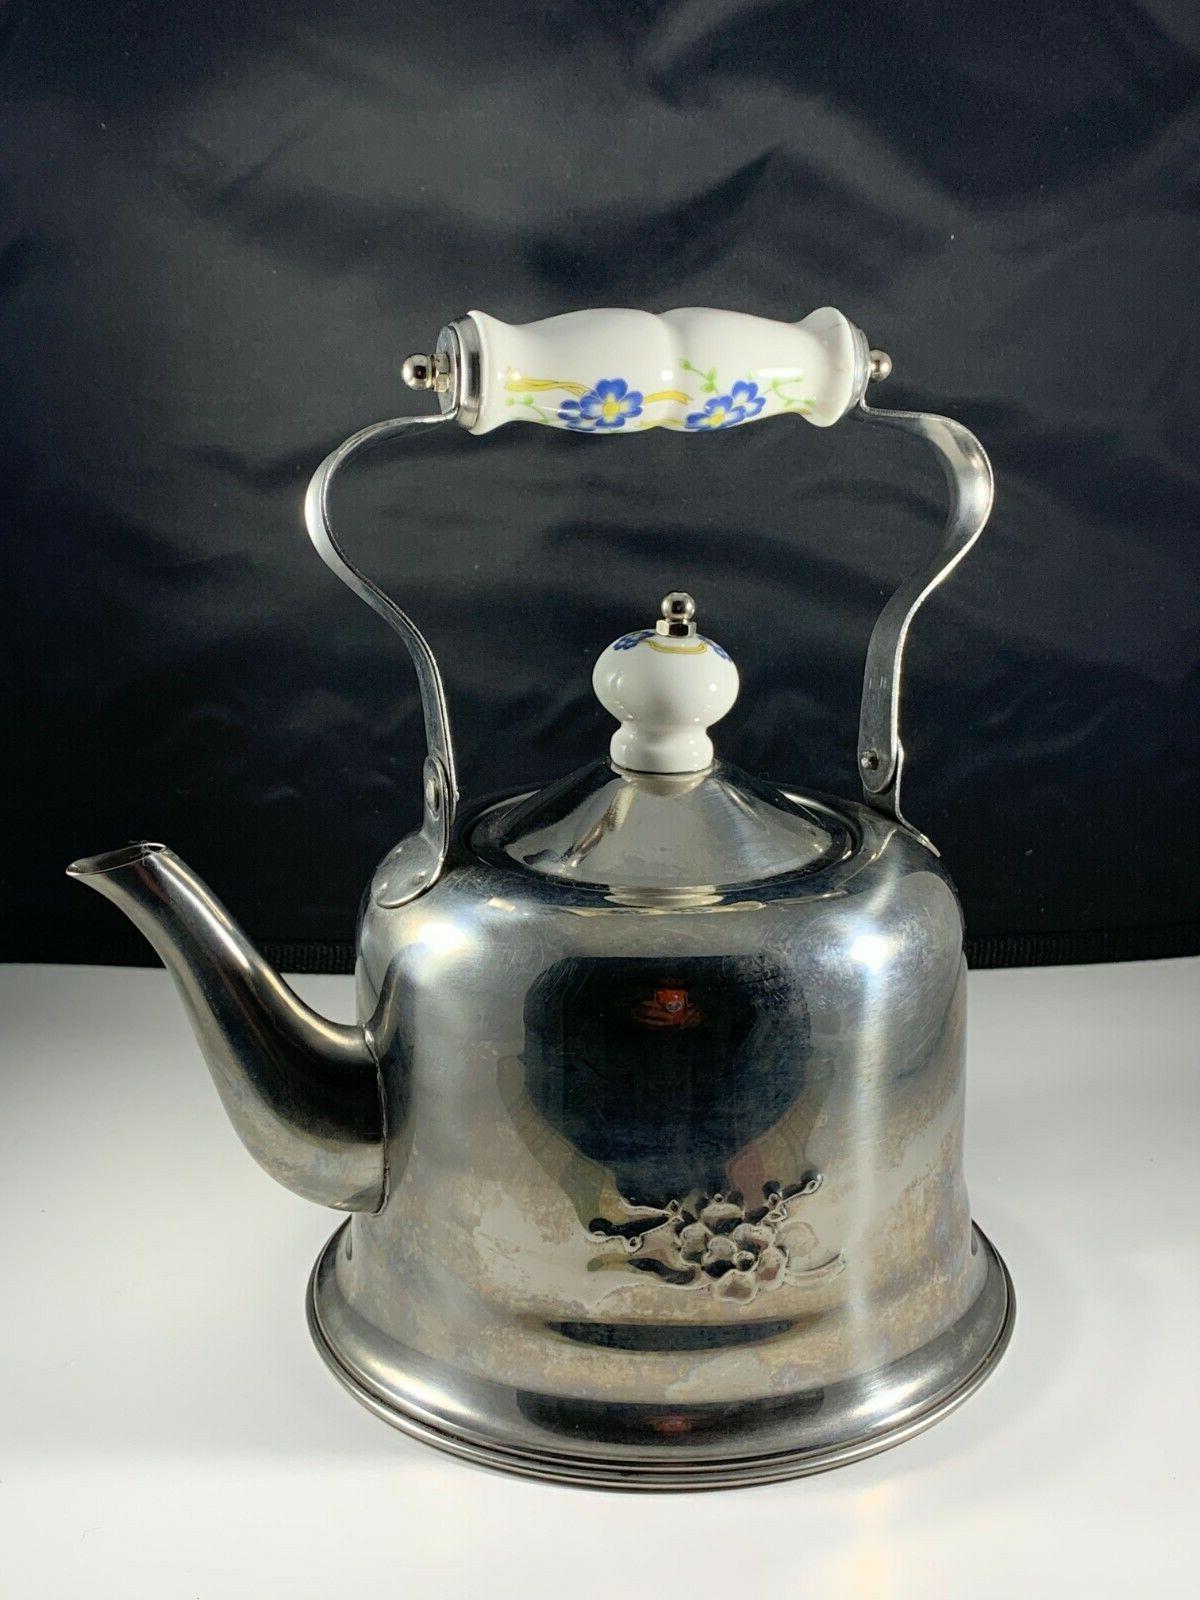 Vintage KitchenArt Tea Pot Stainless Steel Lid Blue/White